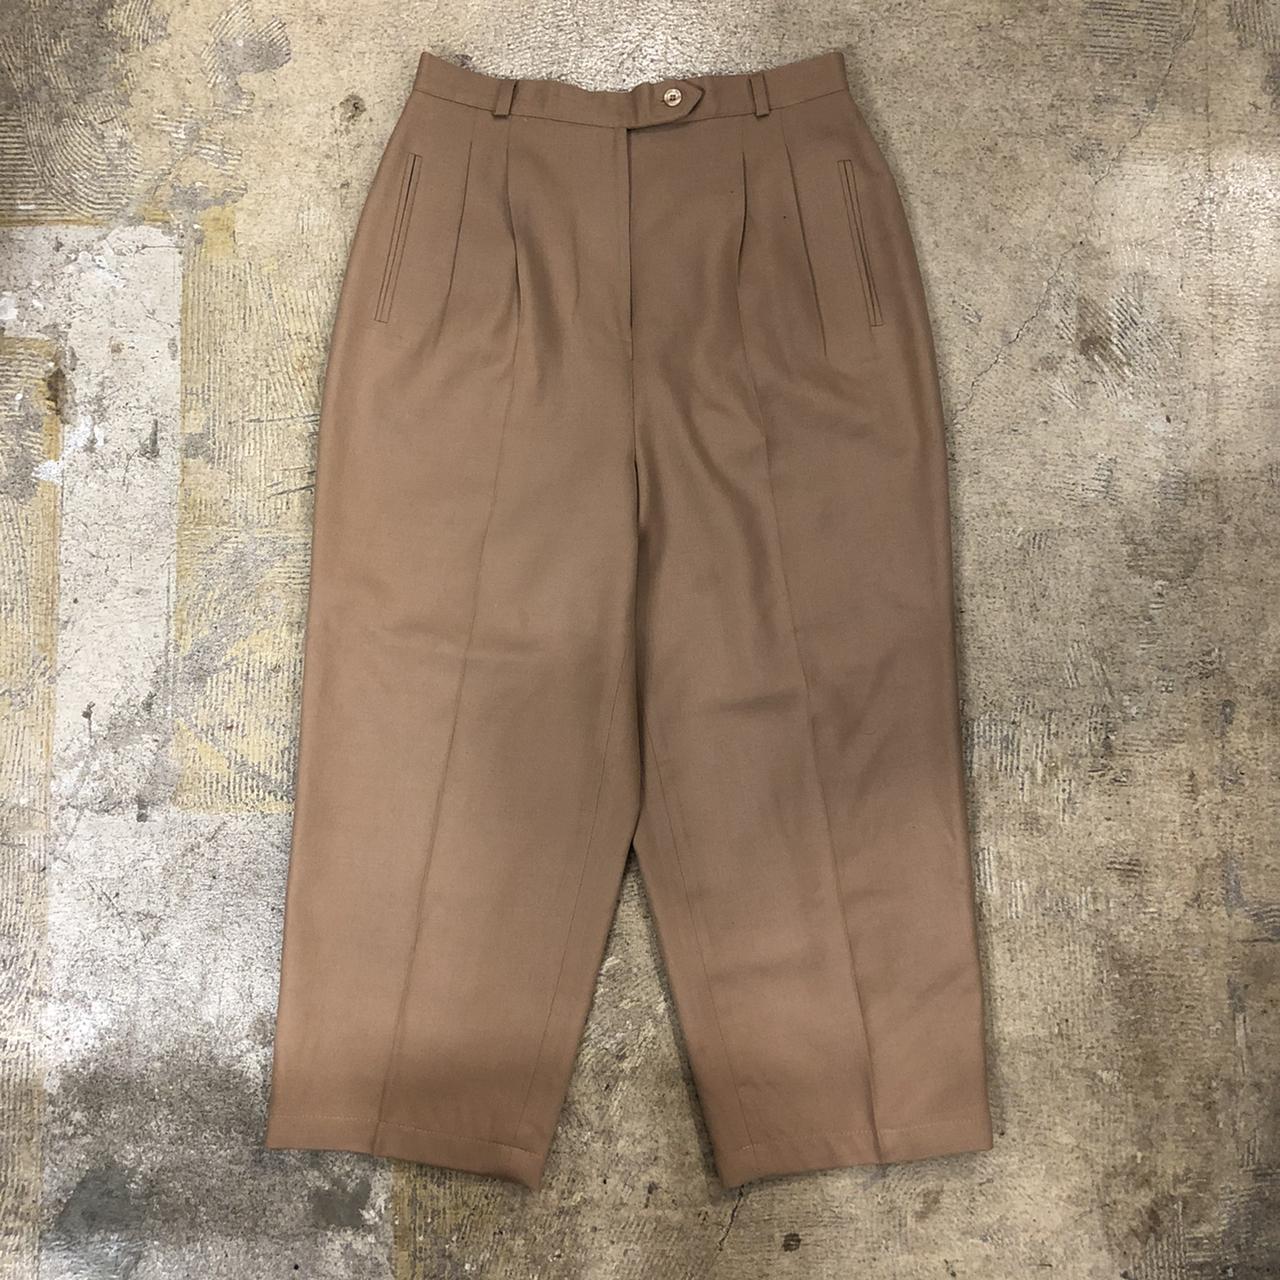 Amberstone Wool Pants ¥5,700+tax